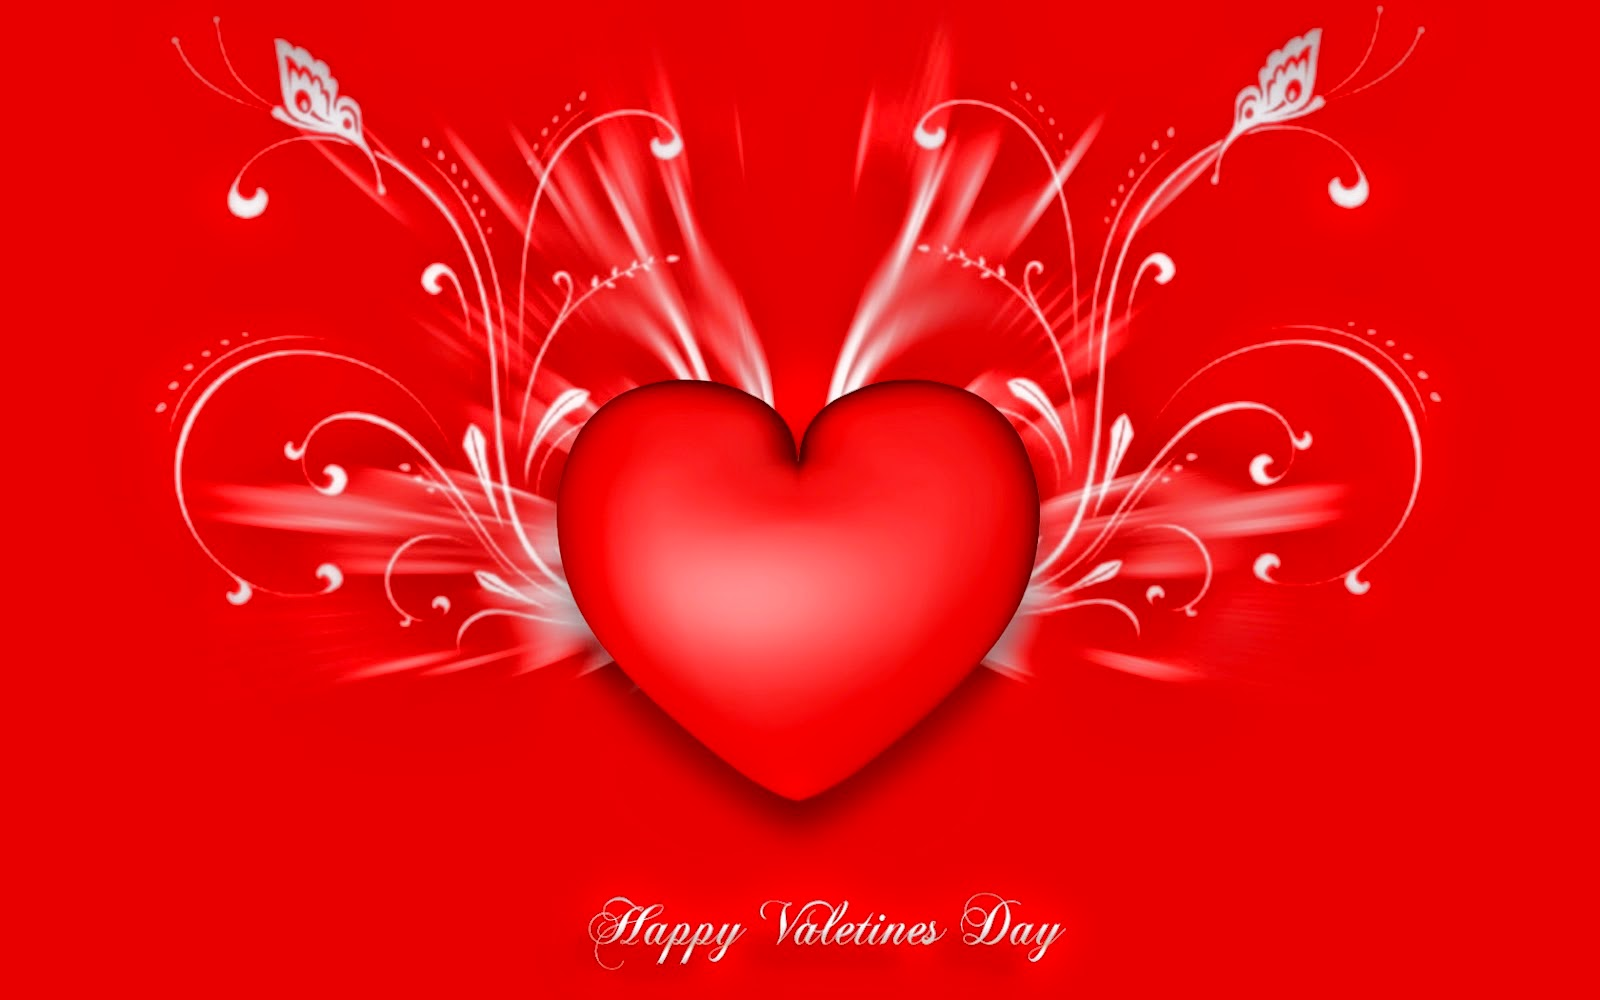 Happy Valentines Day 2015 Poems